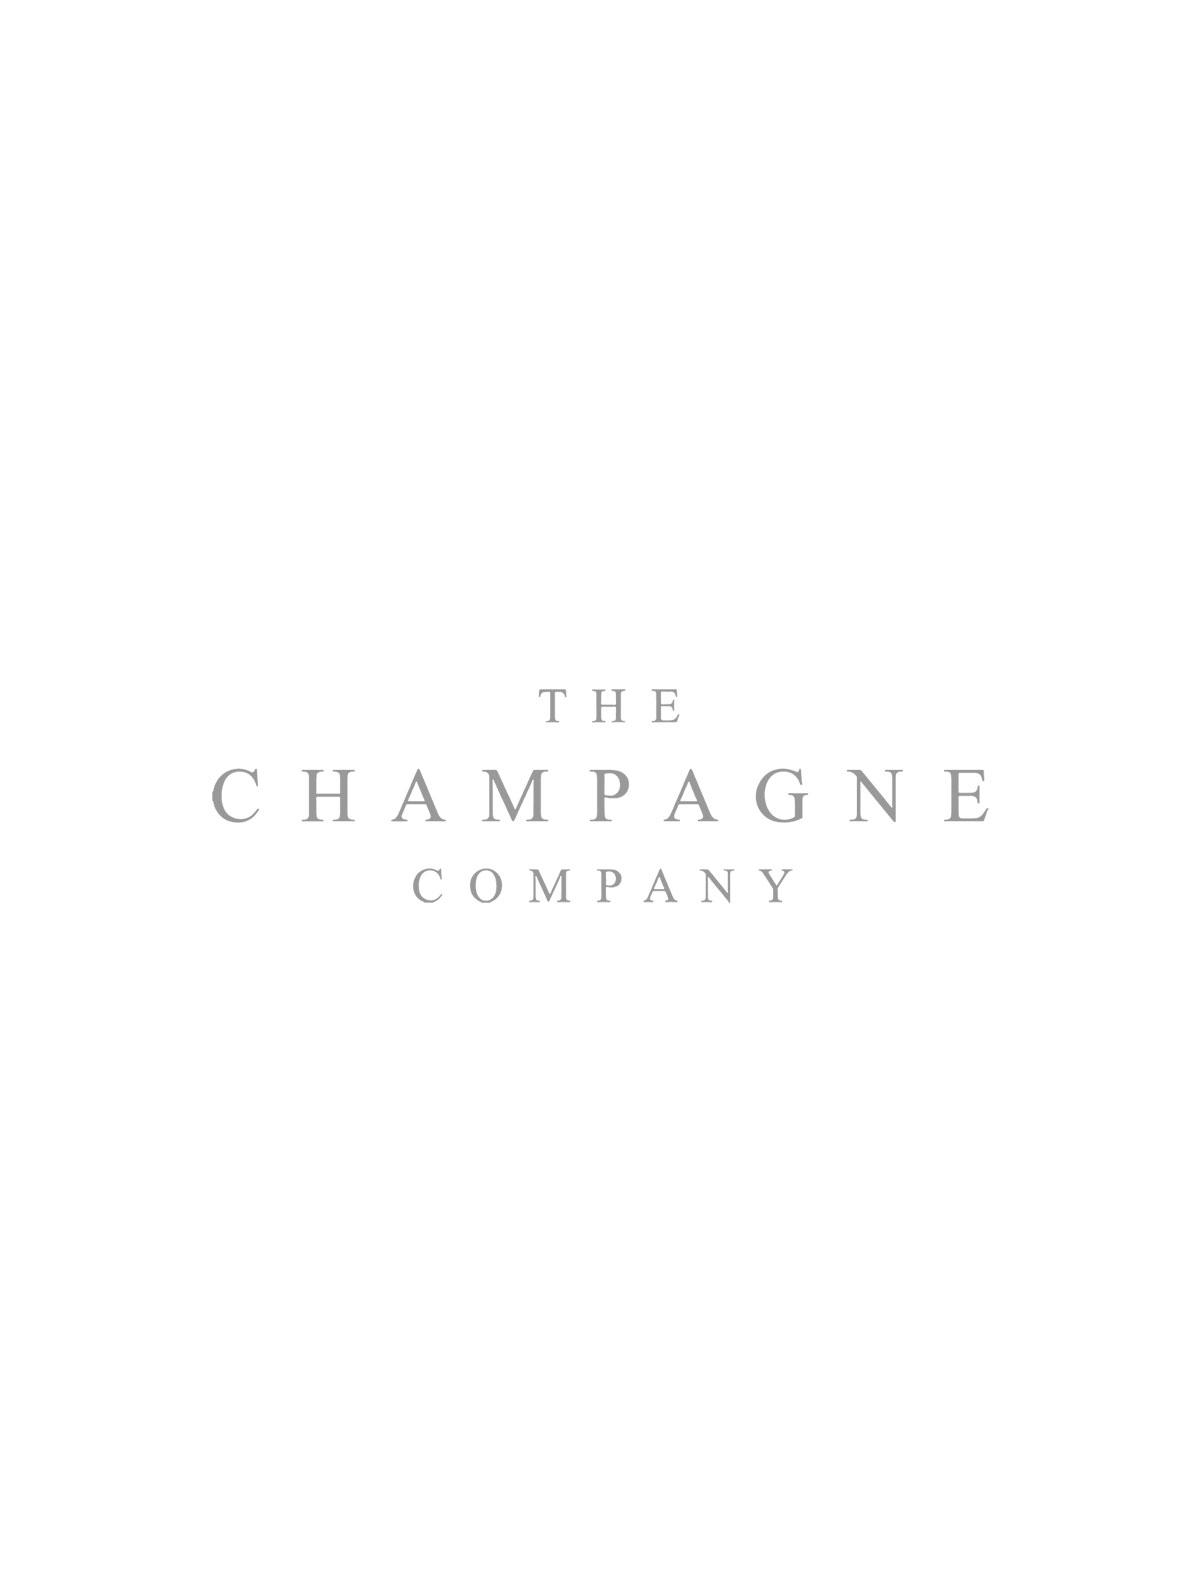 Veuve Clicquot Ponsardin 2008 Vintage Brut Champagne 75cl